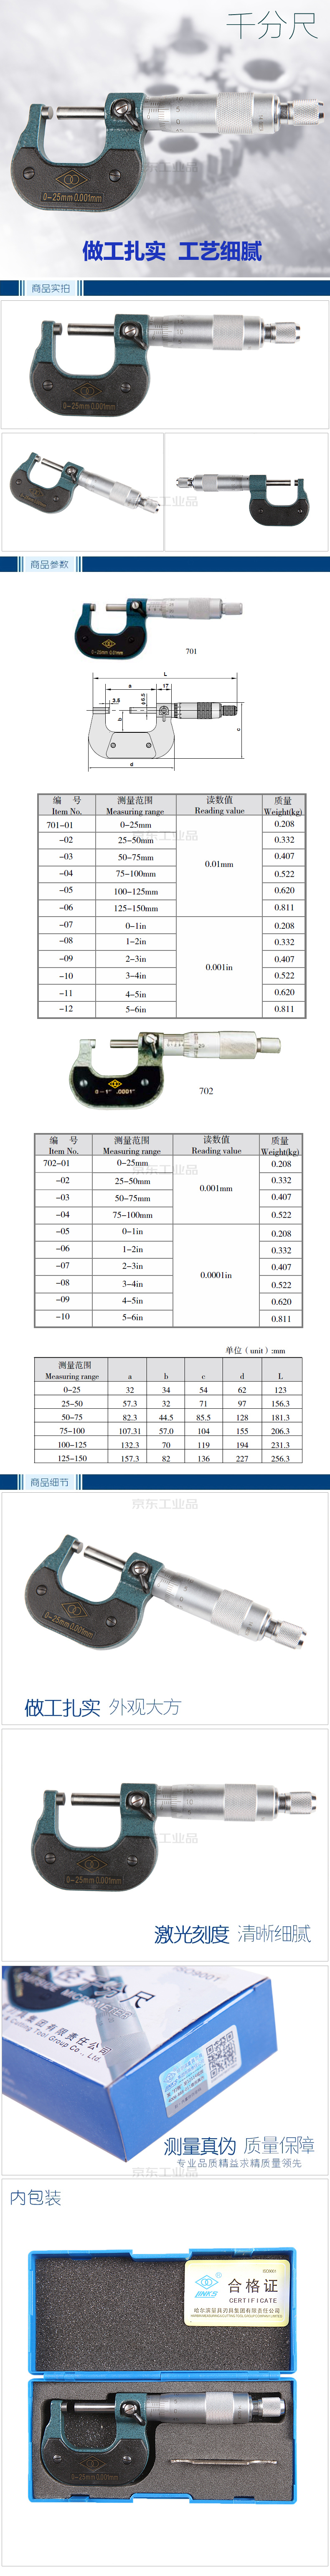 哈量(LINKS) 外径千分尺25-50mm/0.004;701-02